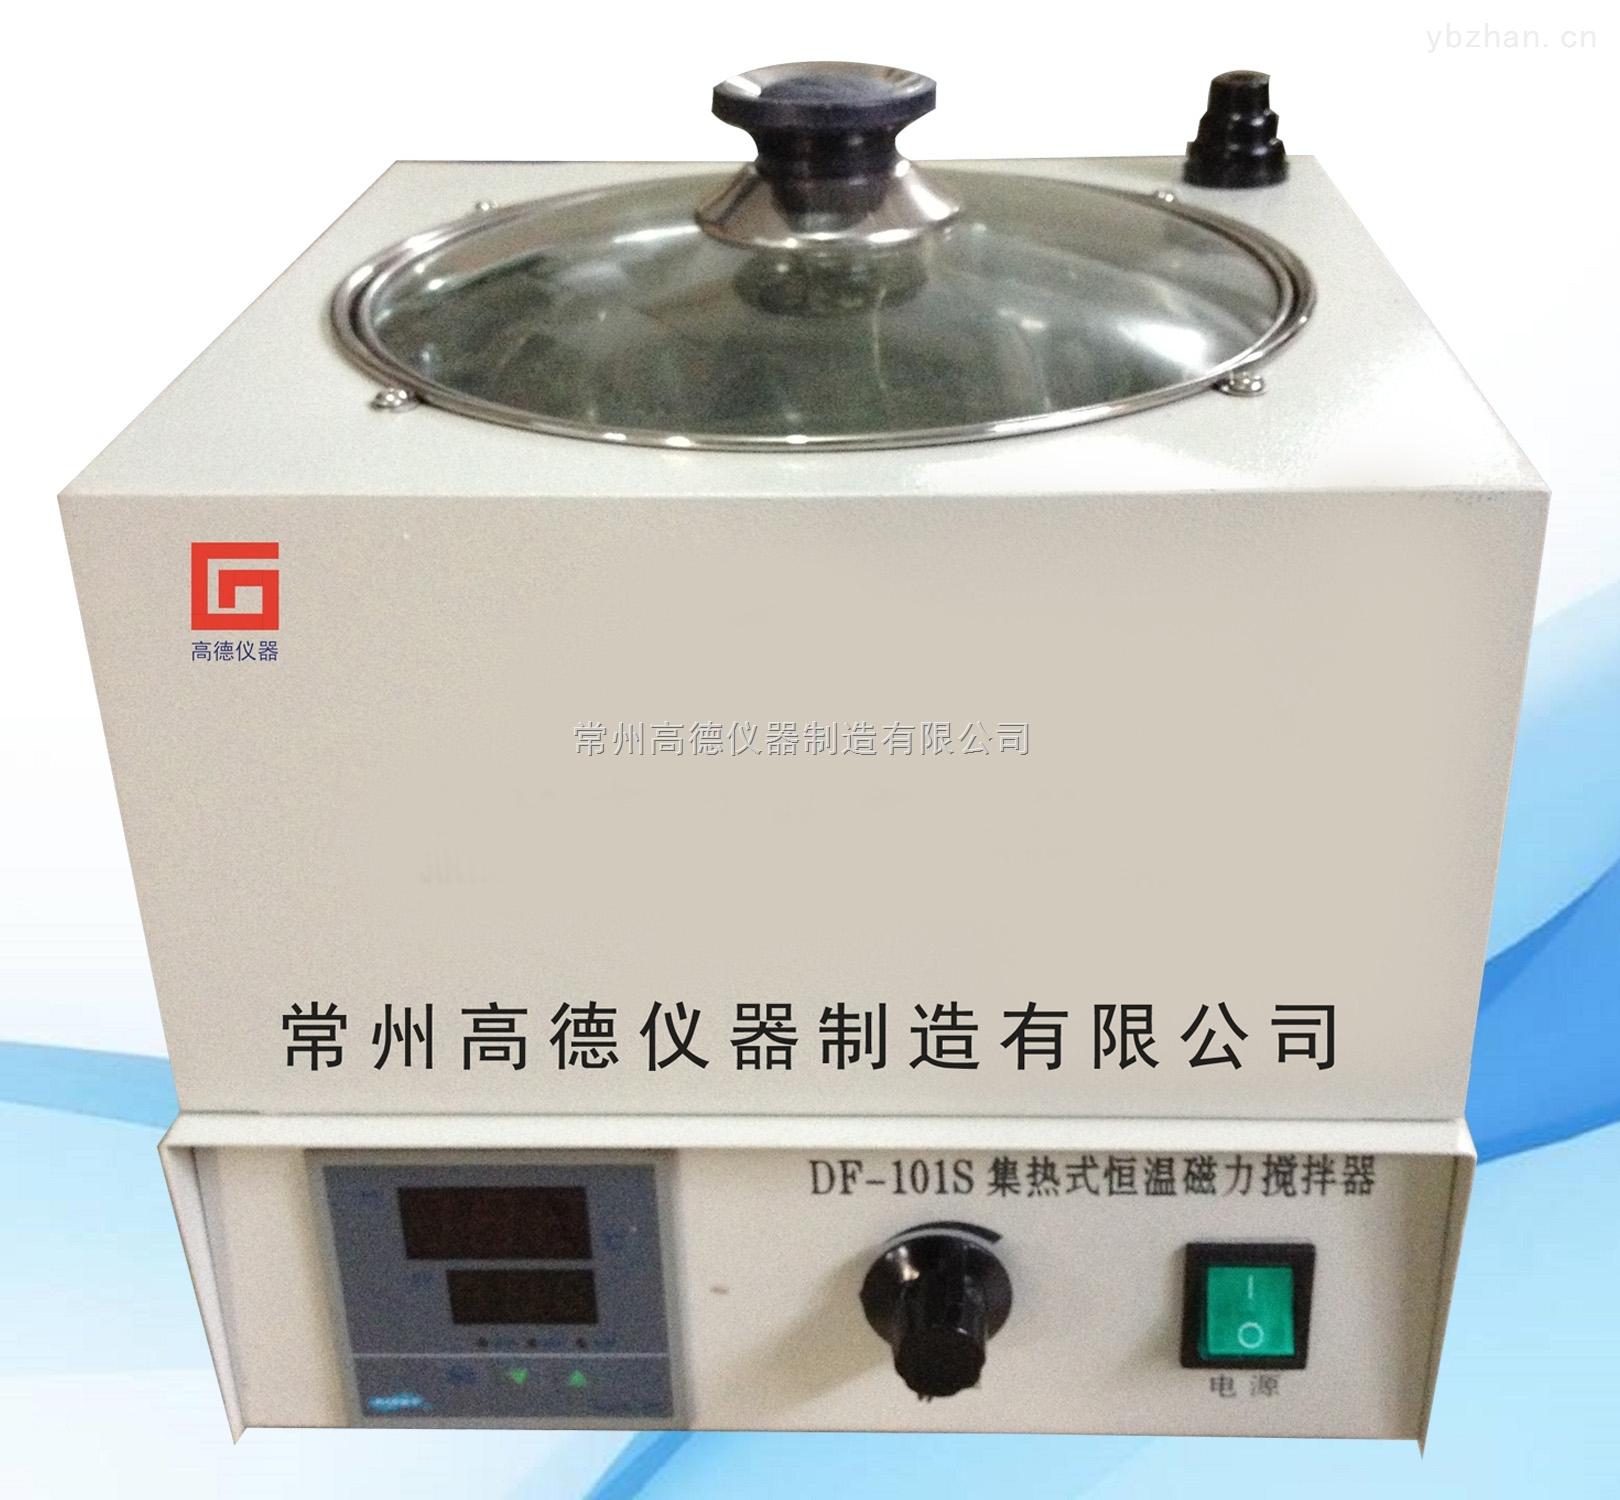 DF-101S-集熱式磁力攪拌器廠家